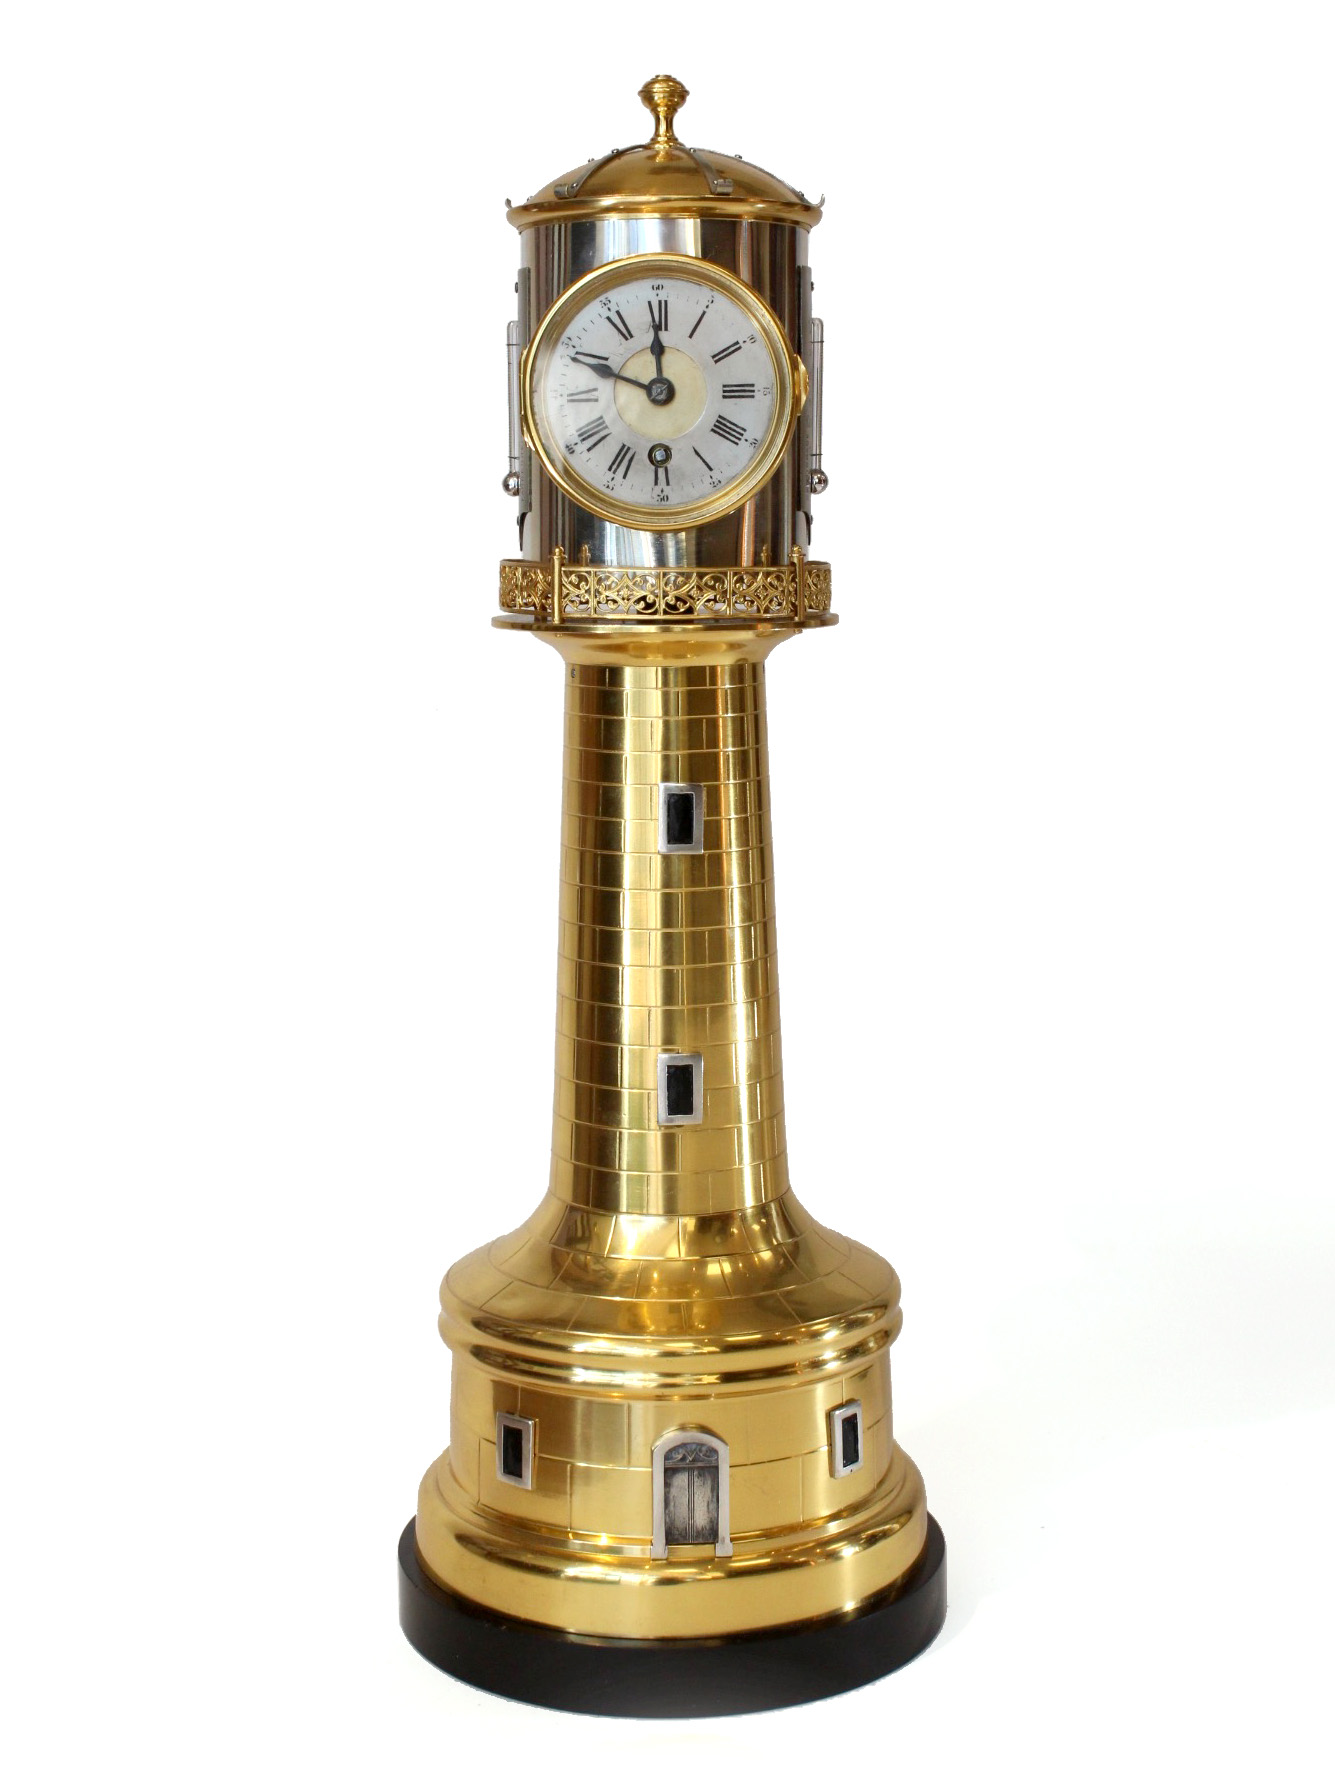 Guilmet Lighthouse Clock With Automaton Carlton Clocks